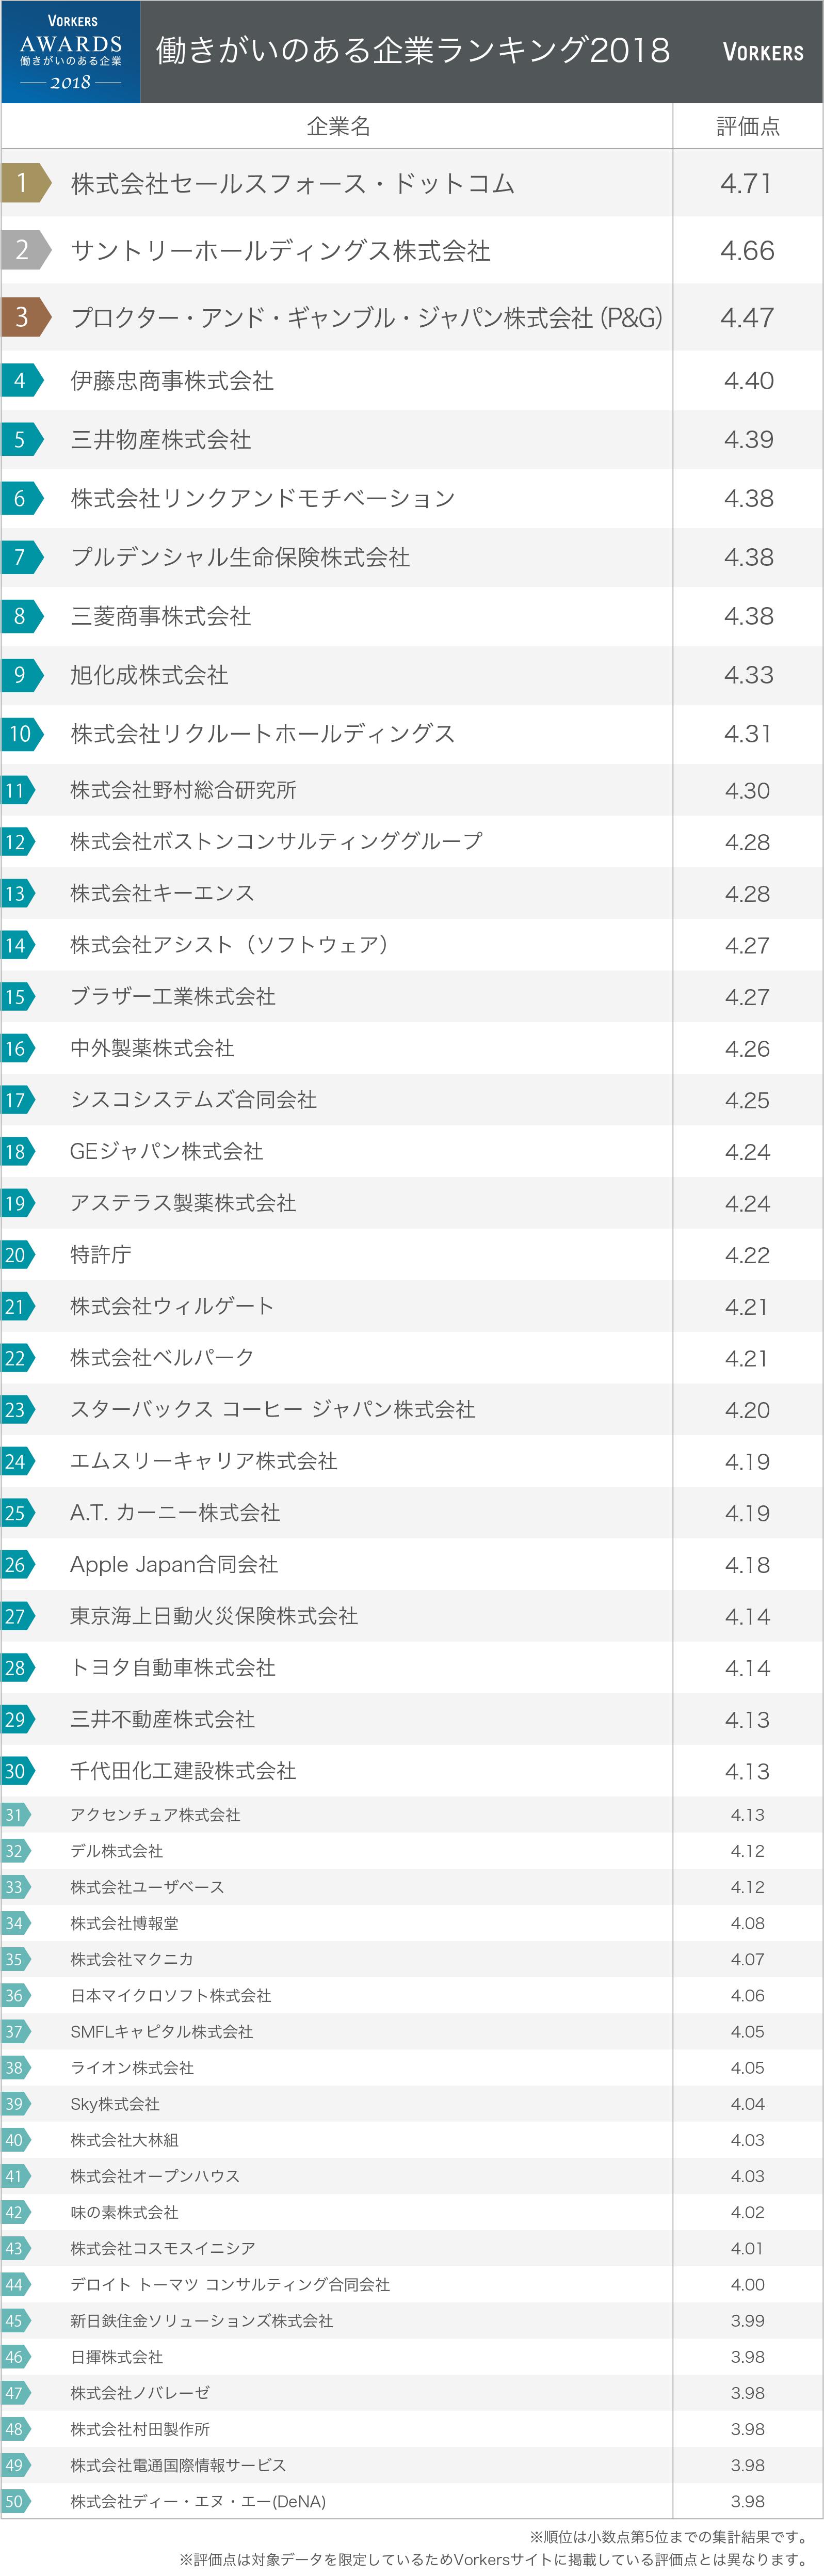 ranking2018_50